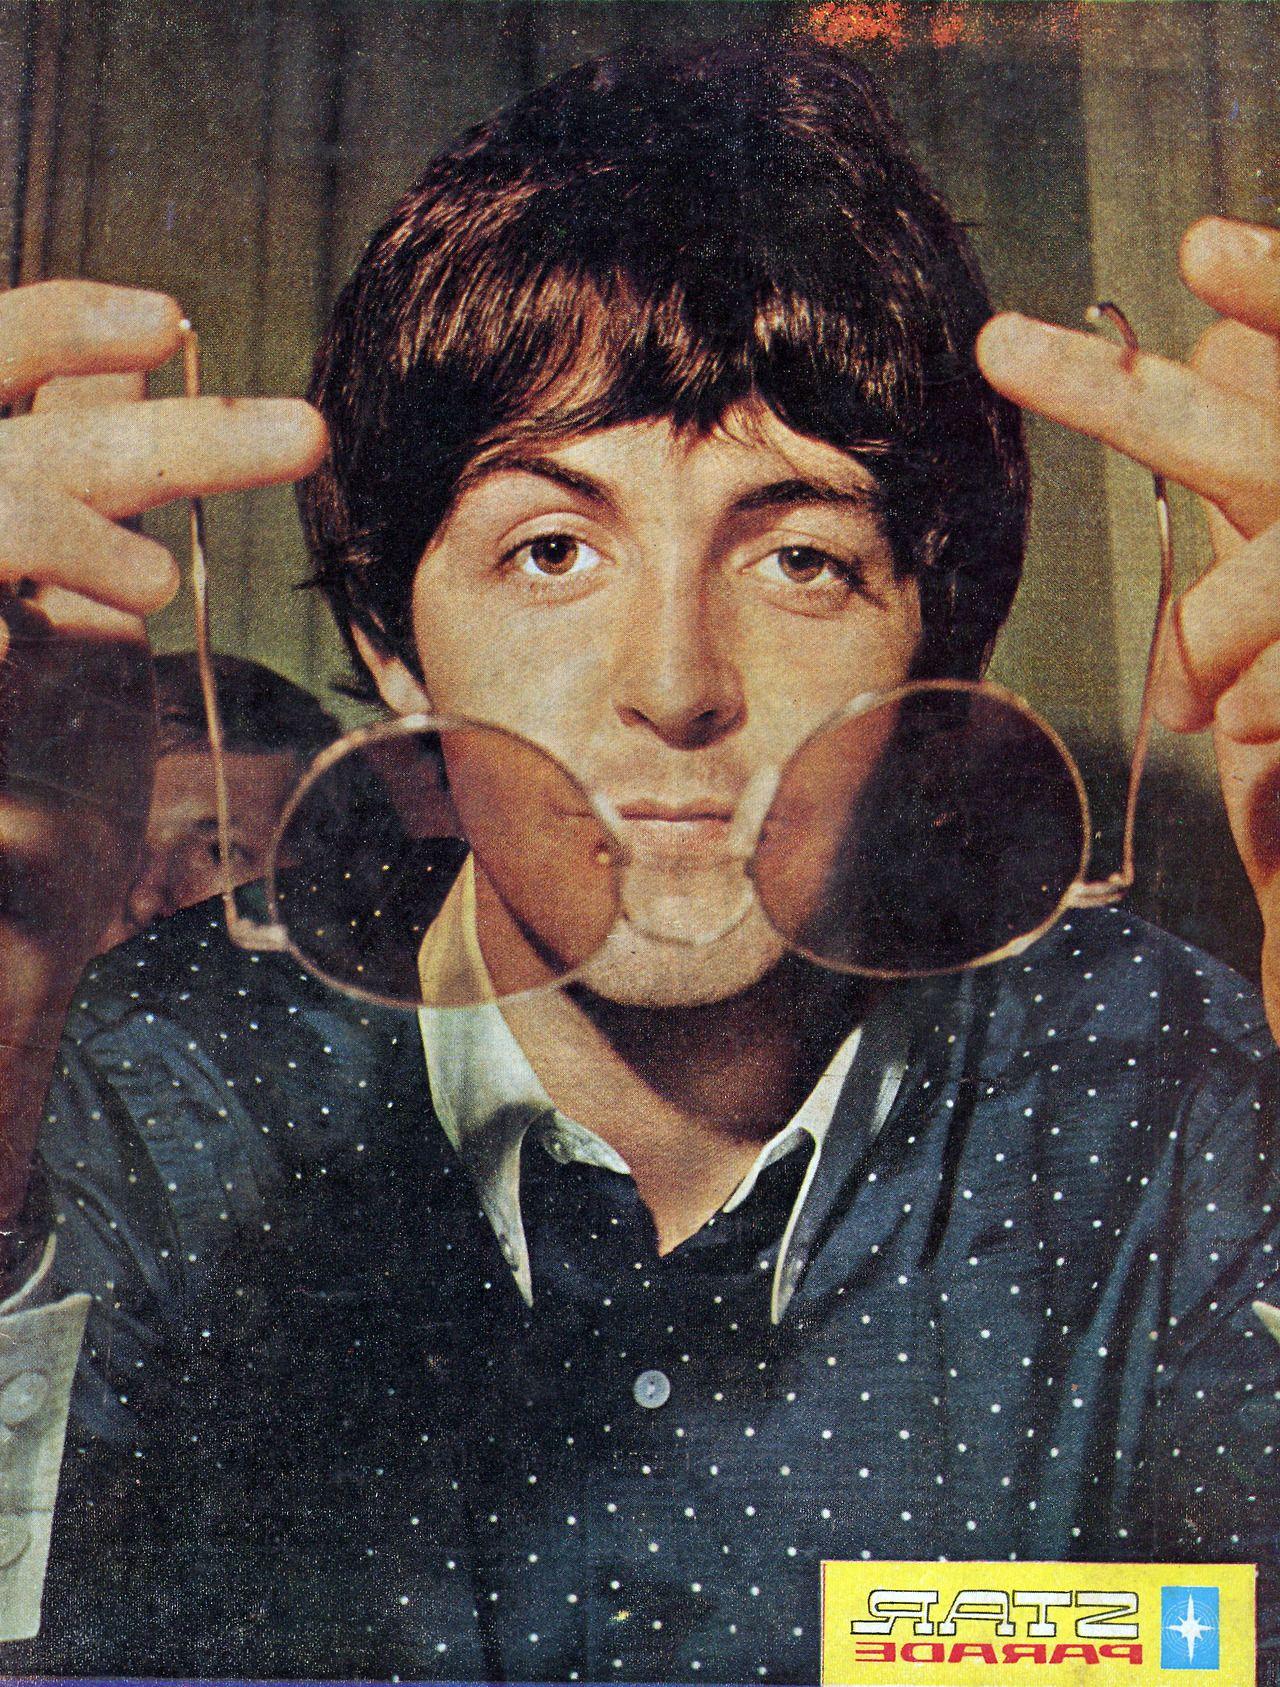 The Beatles, Paul McCartney